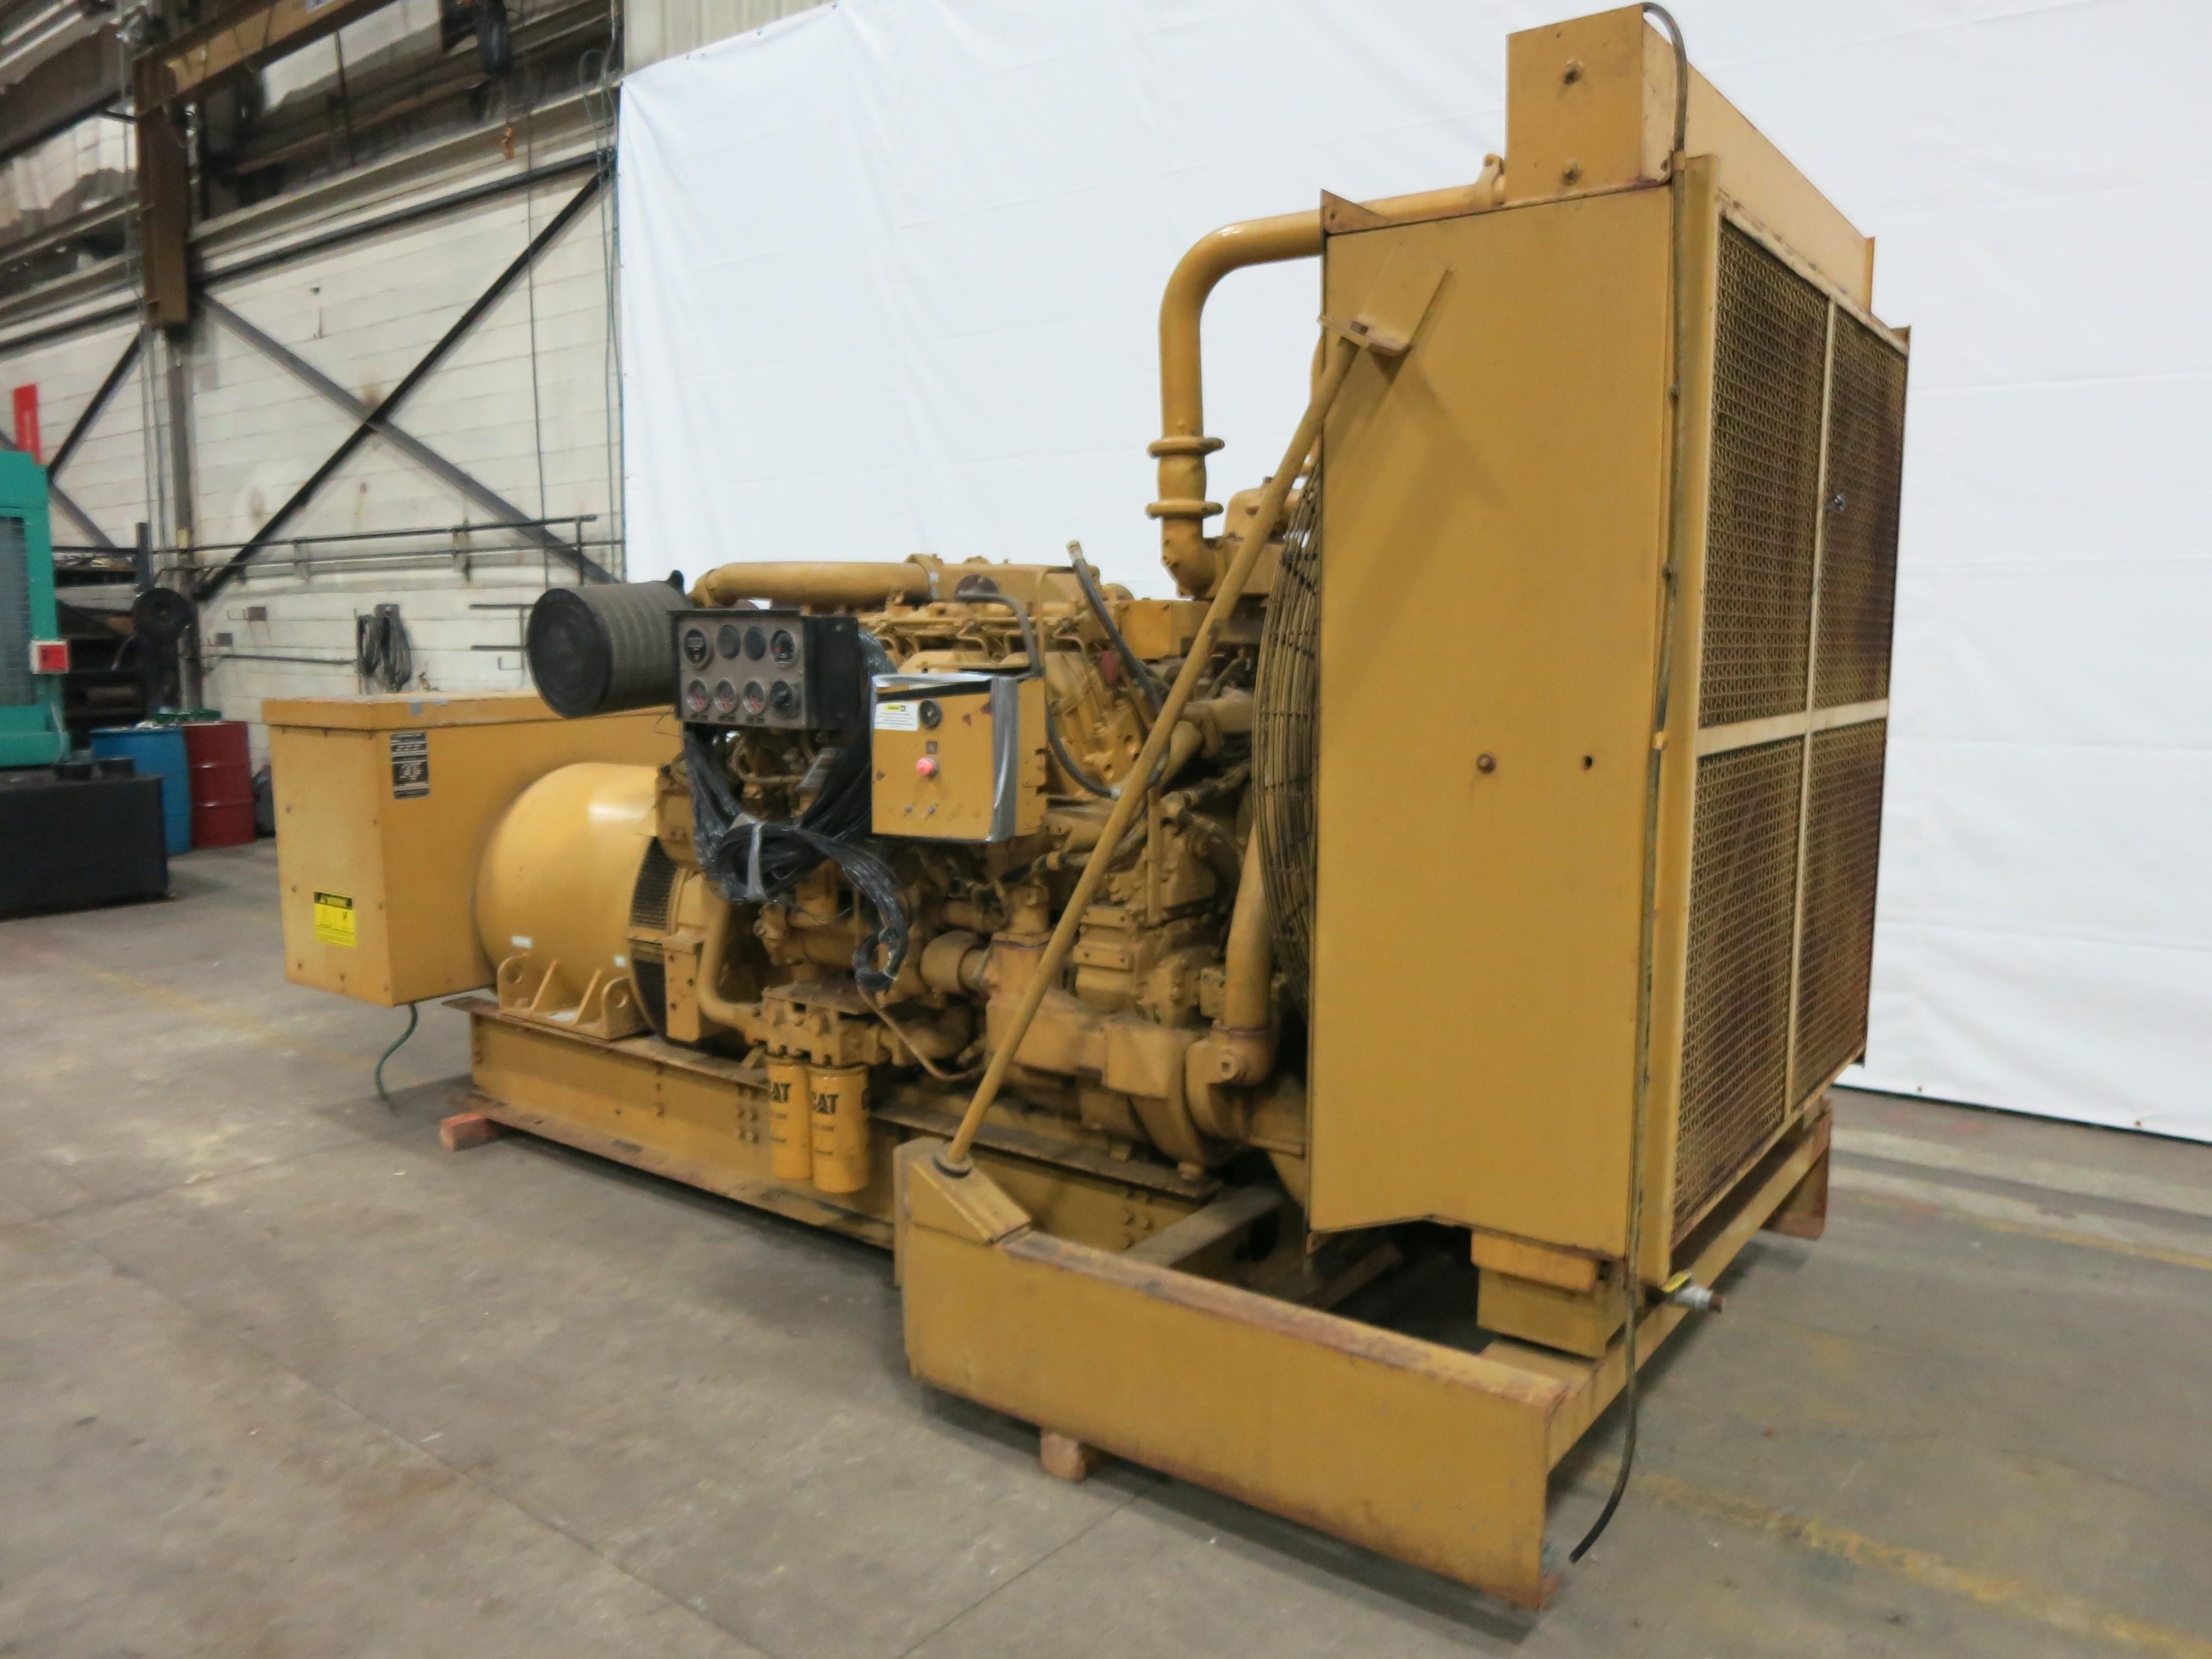 Used Caterpillar 3508 Diesel Generator 970 Hrs